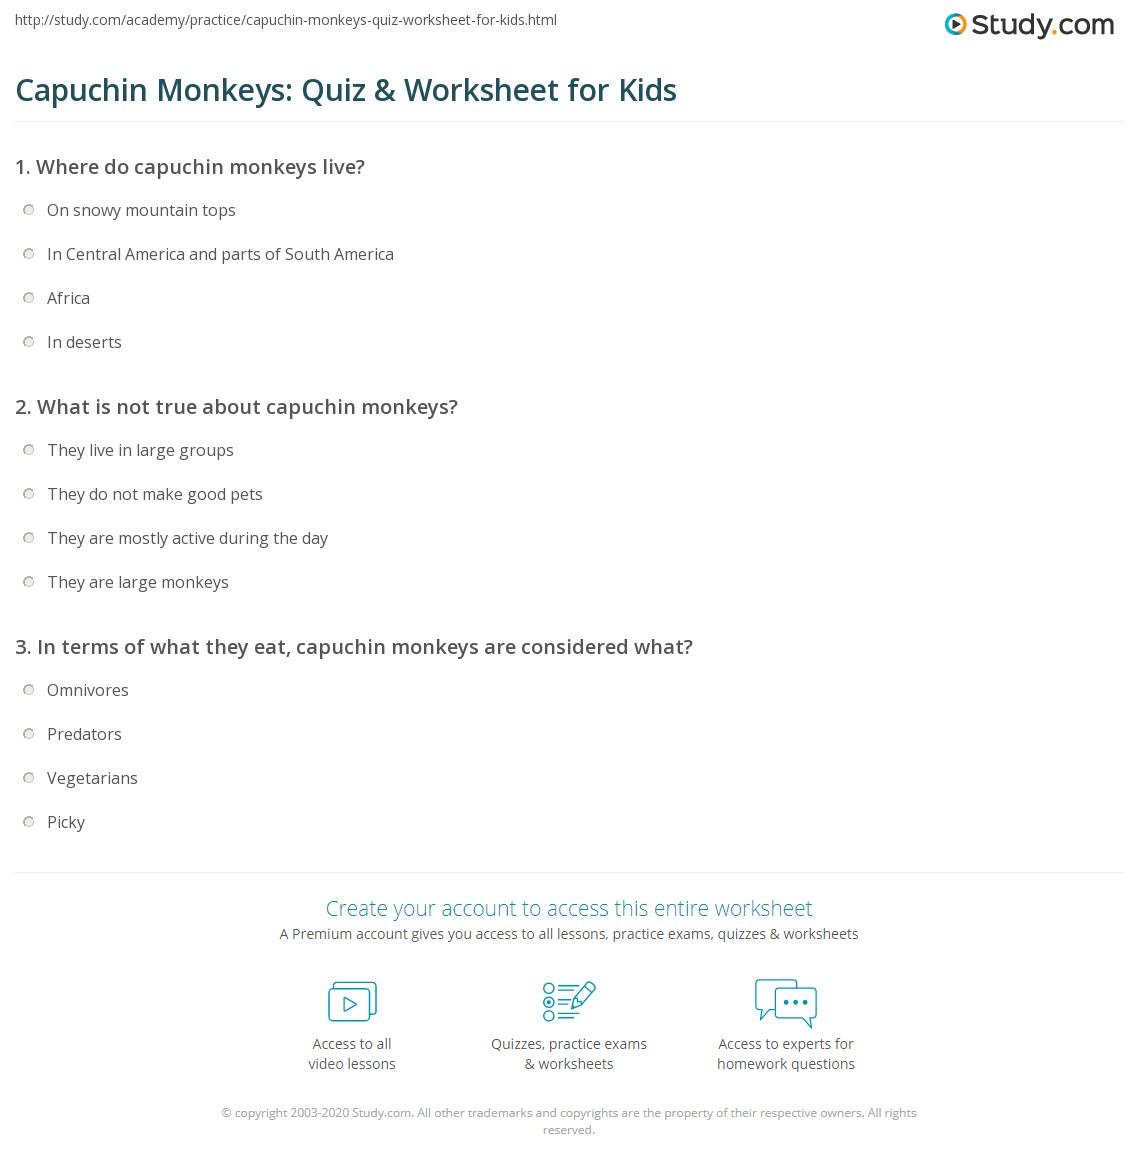 Capuchin Monkeys: Quiz & Worksheet for Kids | Study com